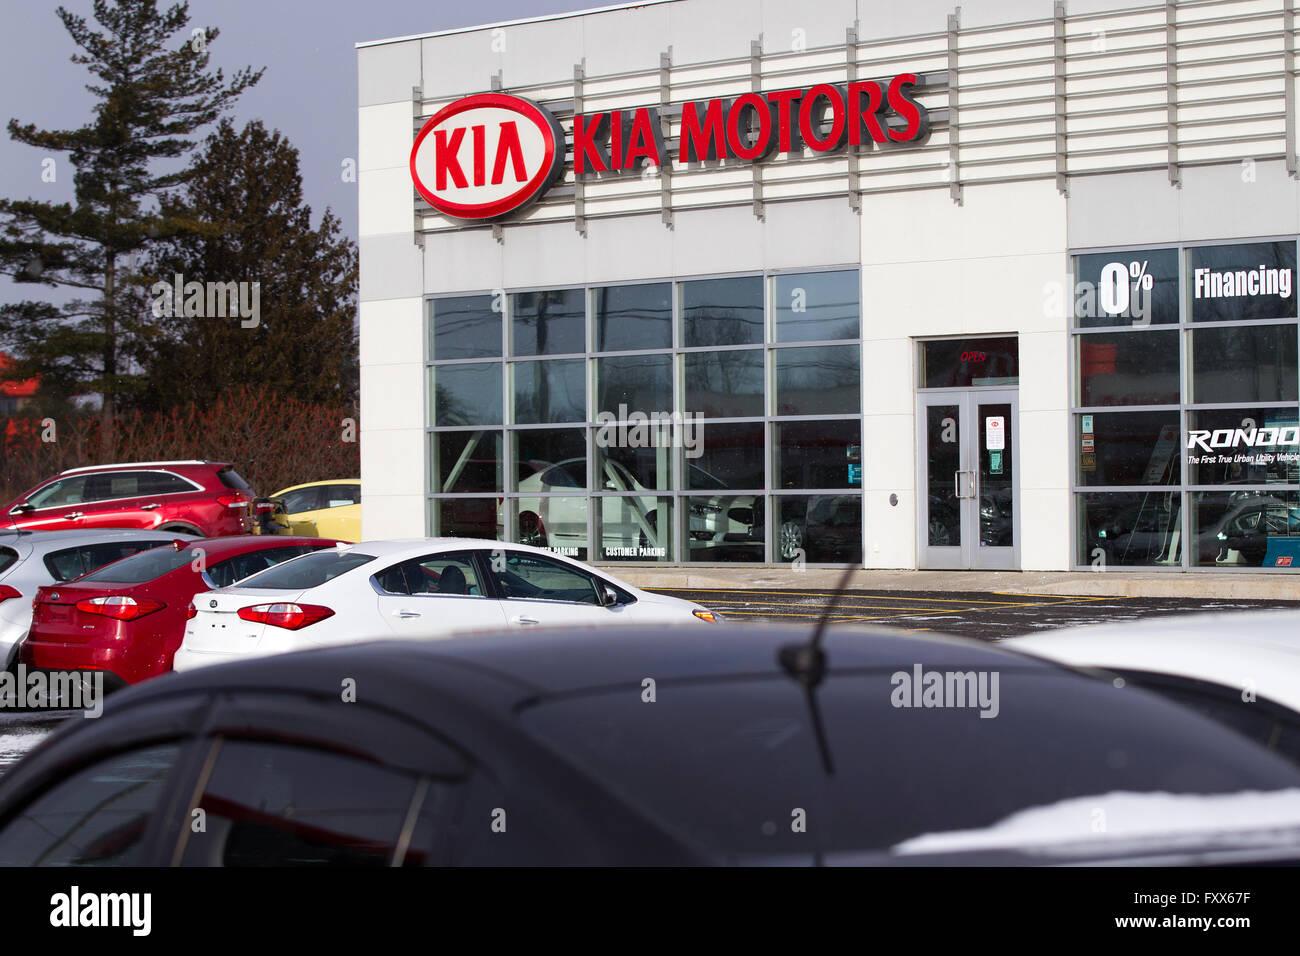 Kia Motors Dealership In Kingston Ont On Monday Jan 11 2016 Stock Photo Royalty Free Image